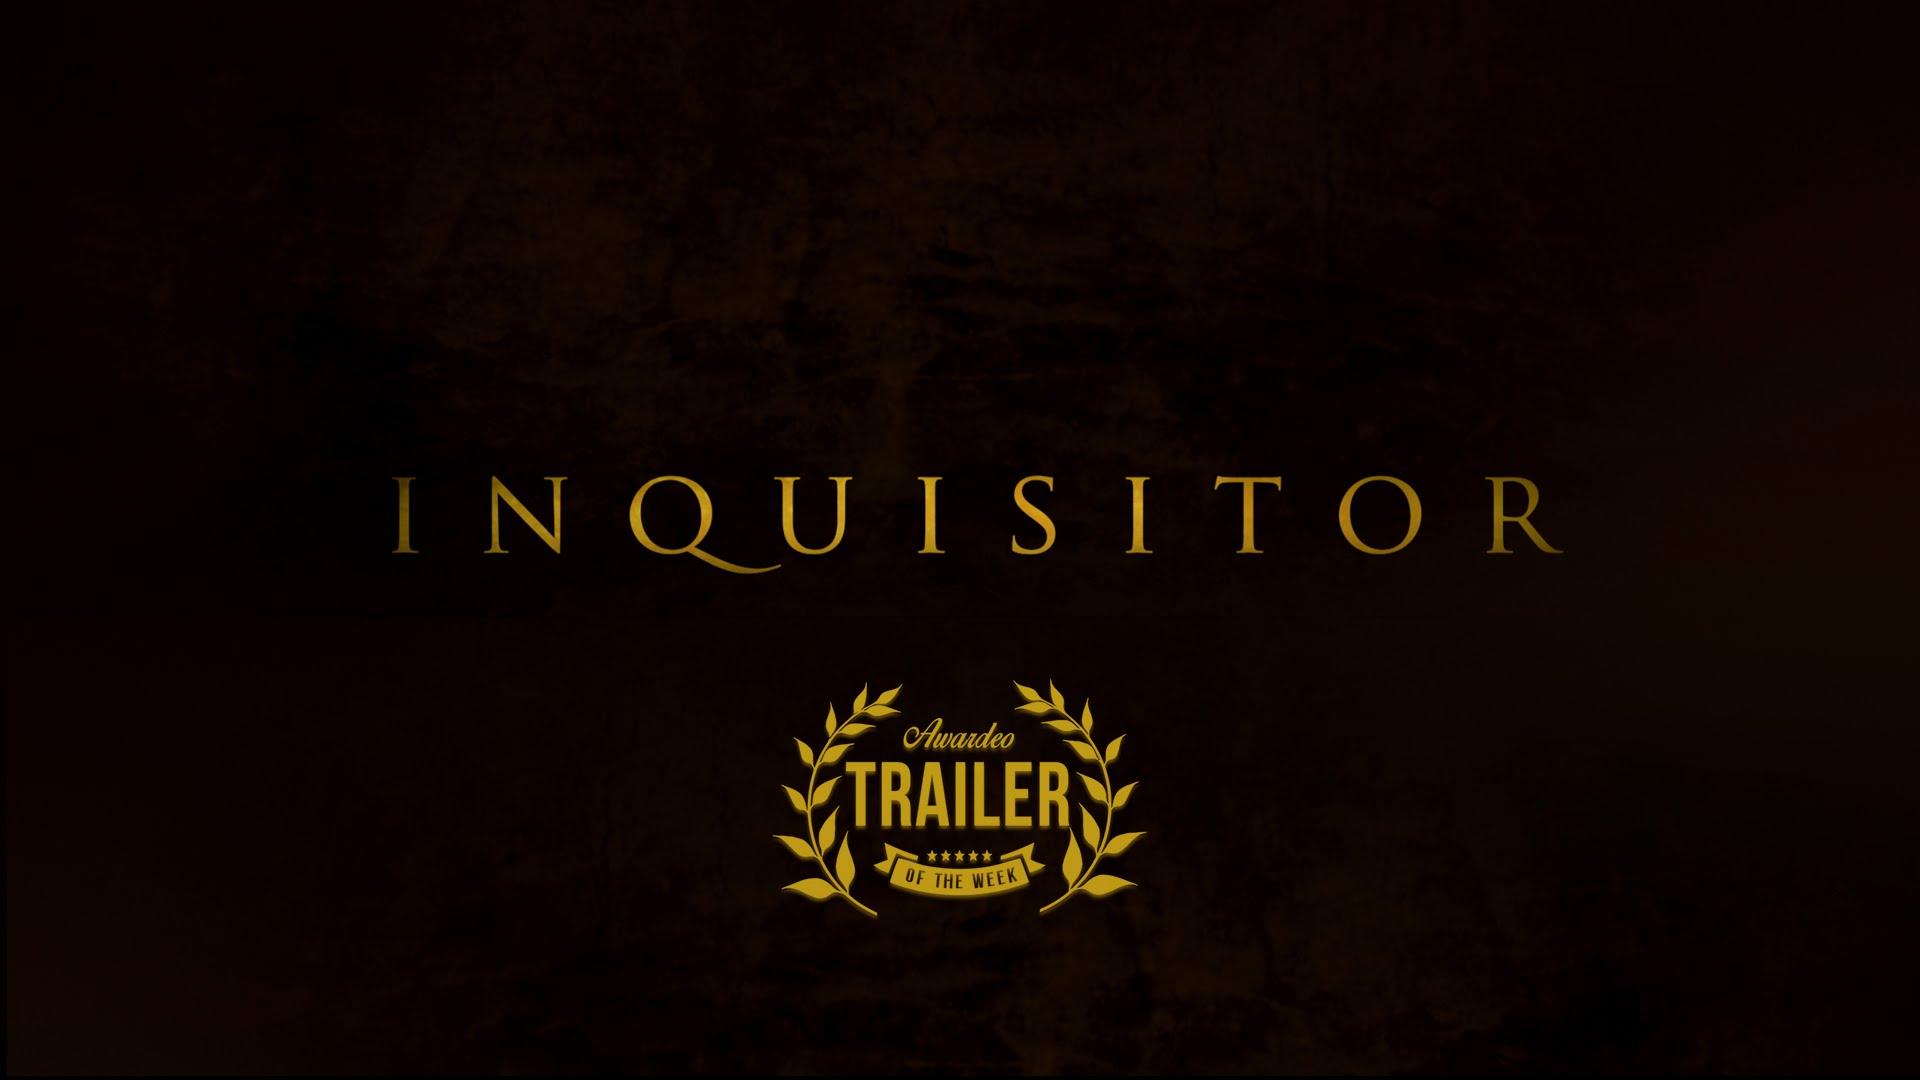 Inquisitor: The Curse of El Dorado - 2017 - Official Teaser Trailer - 4K